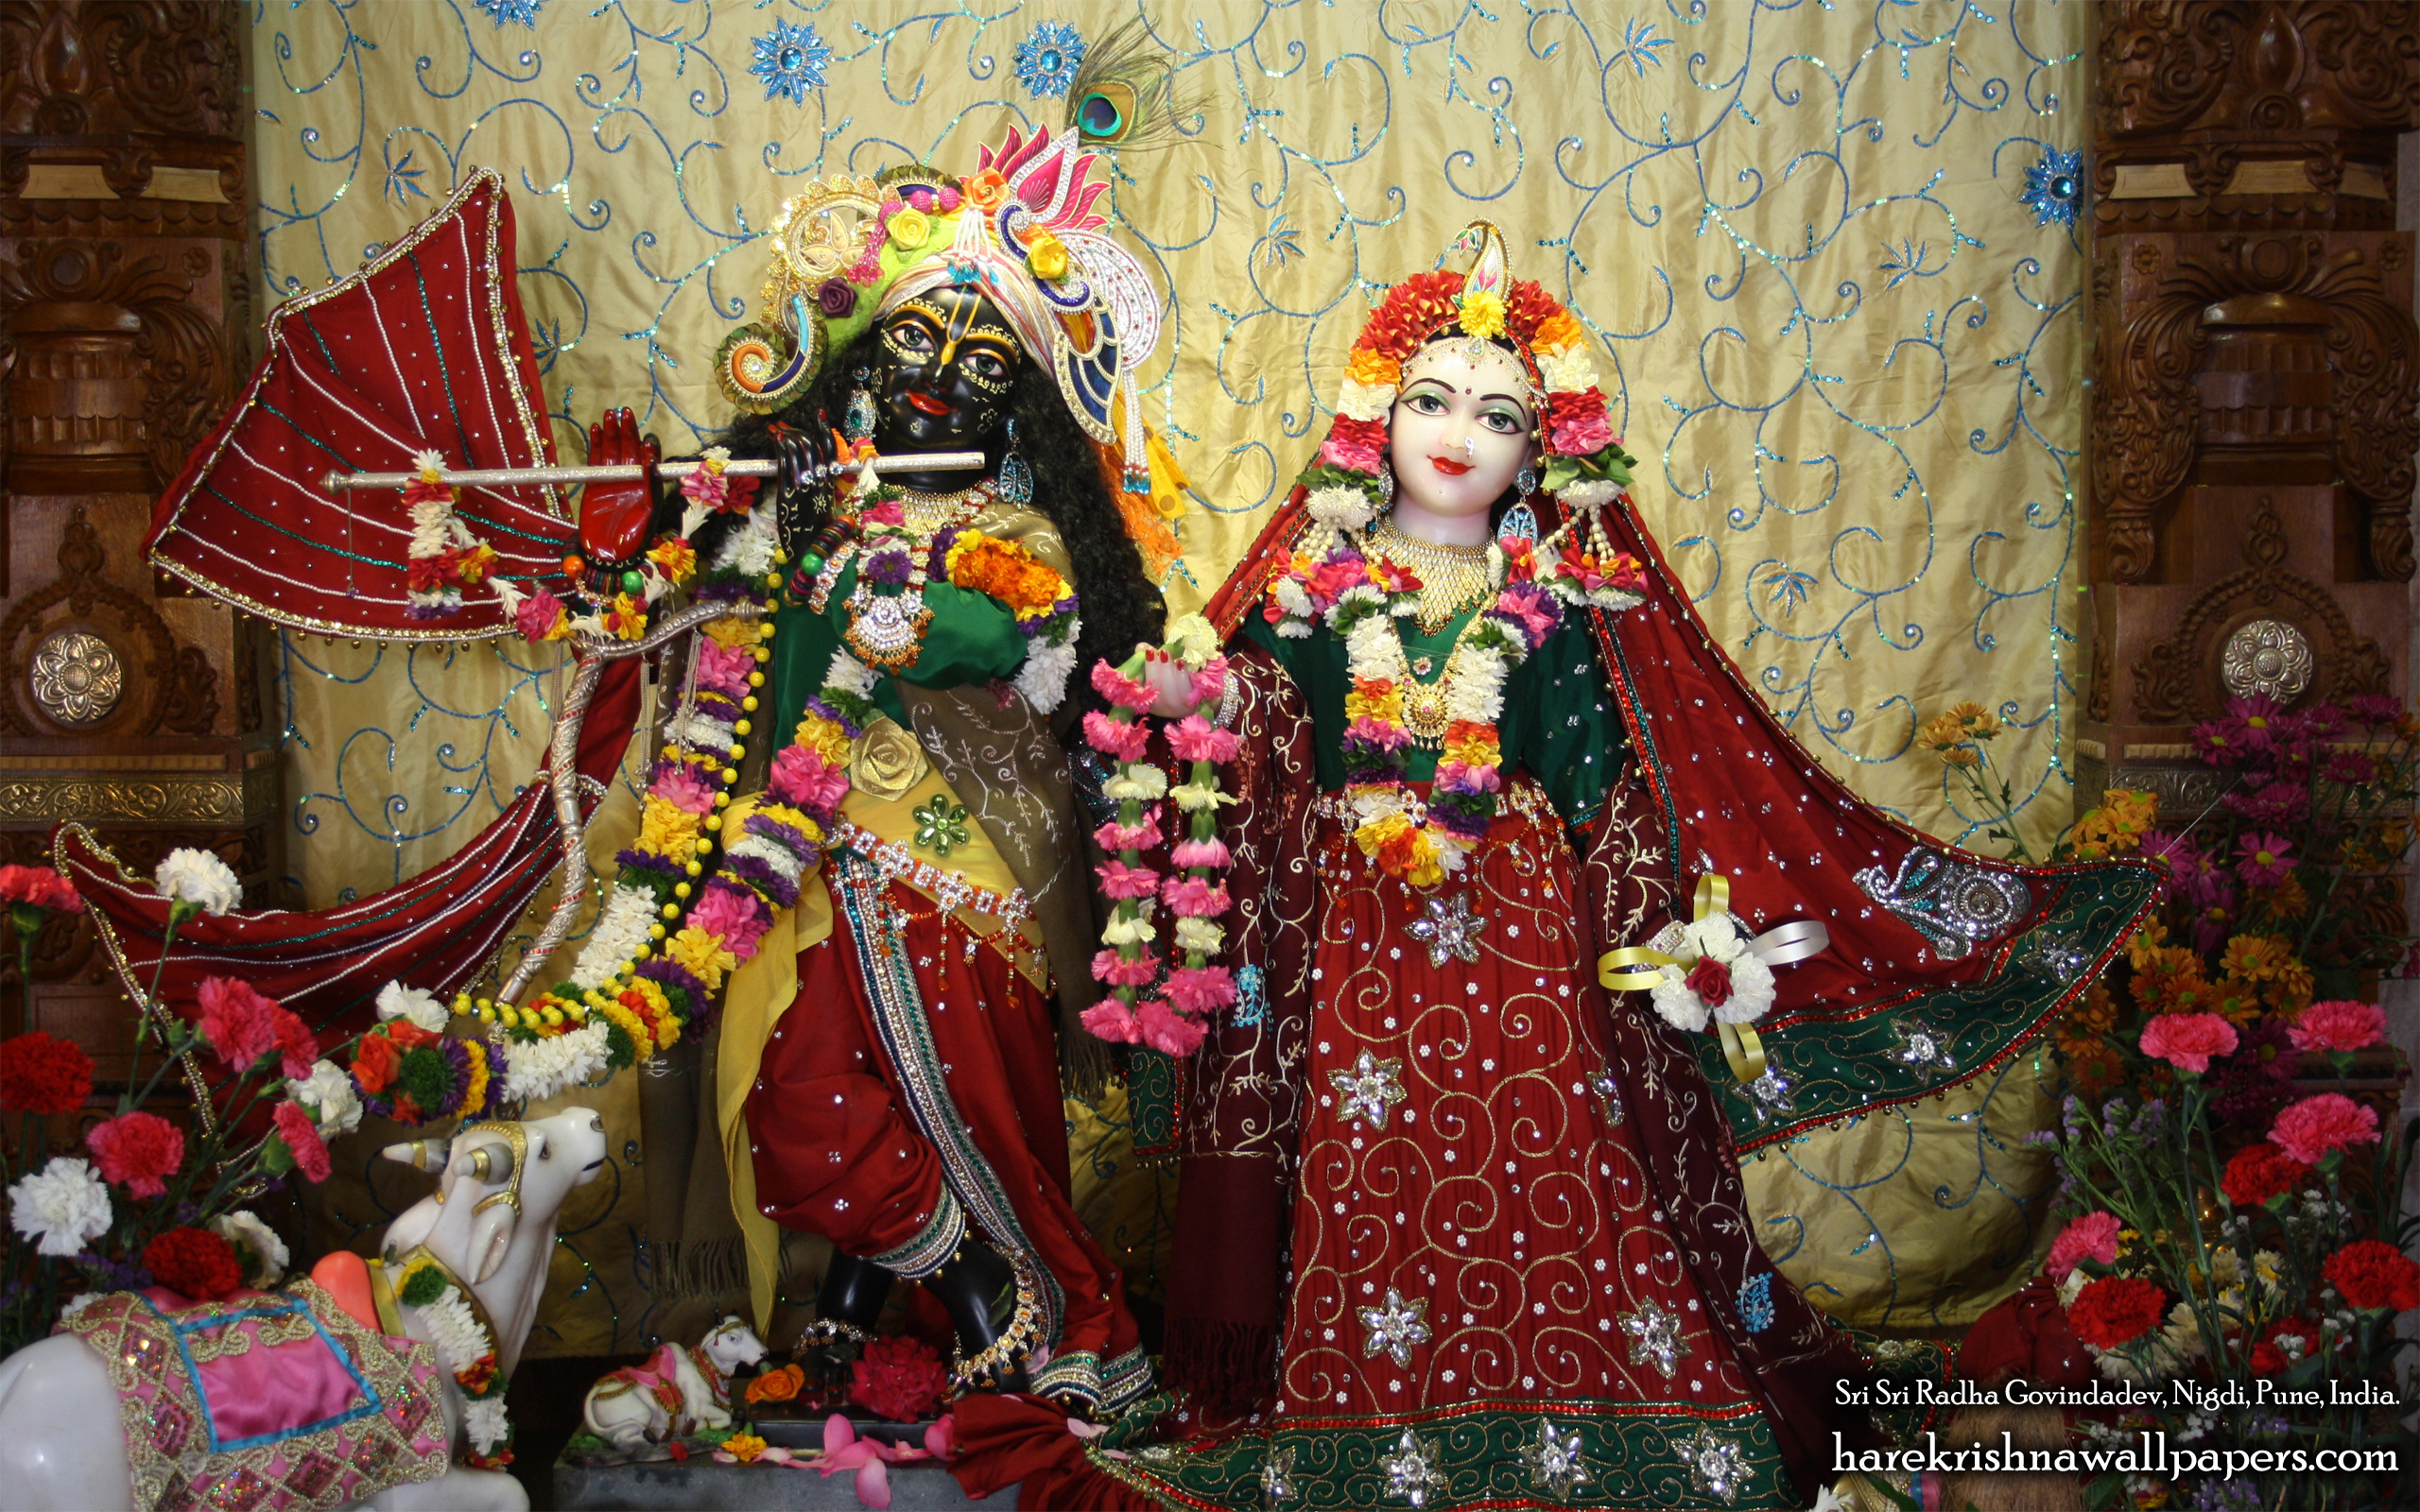 Sri Sri Radha Govind Wallpaper (031) Size 2560x1600 Download